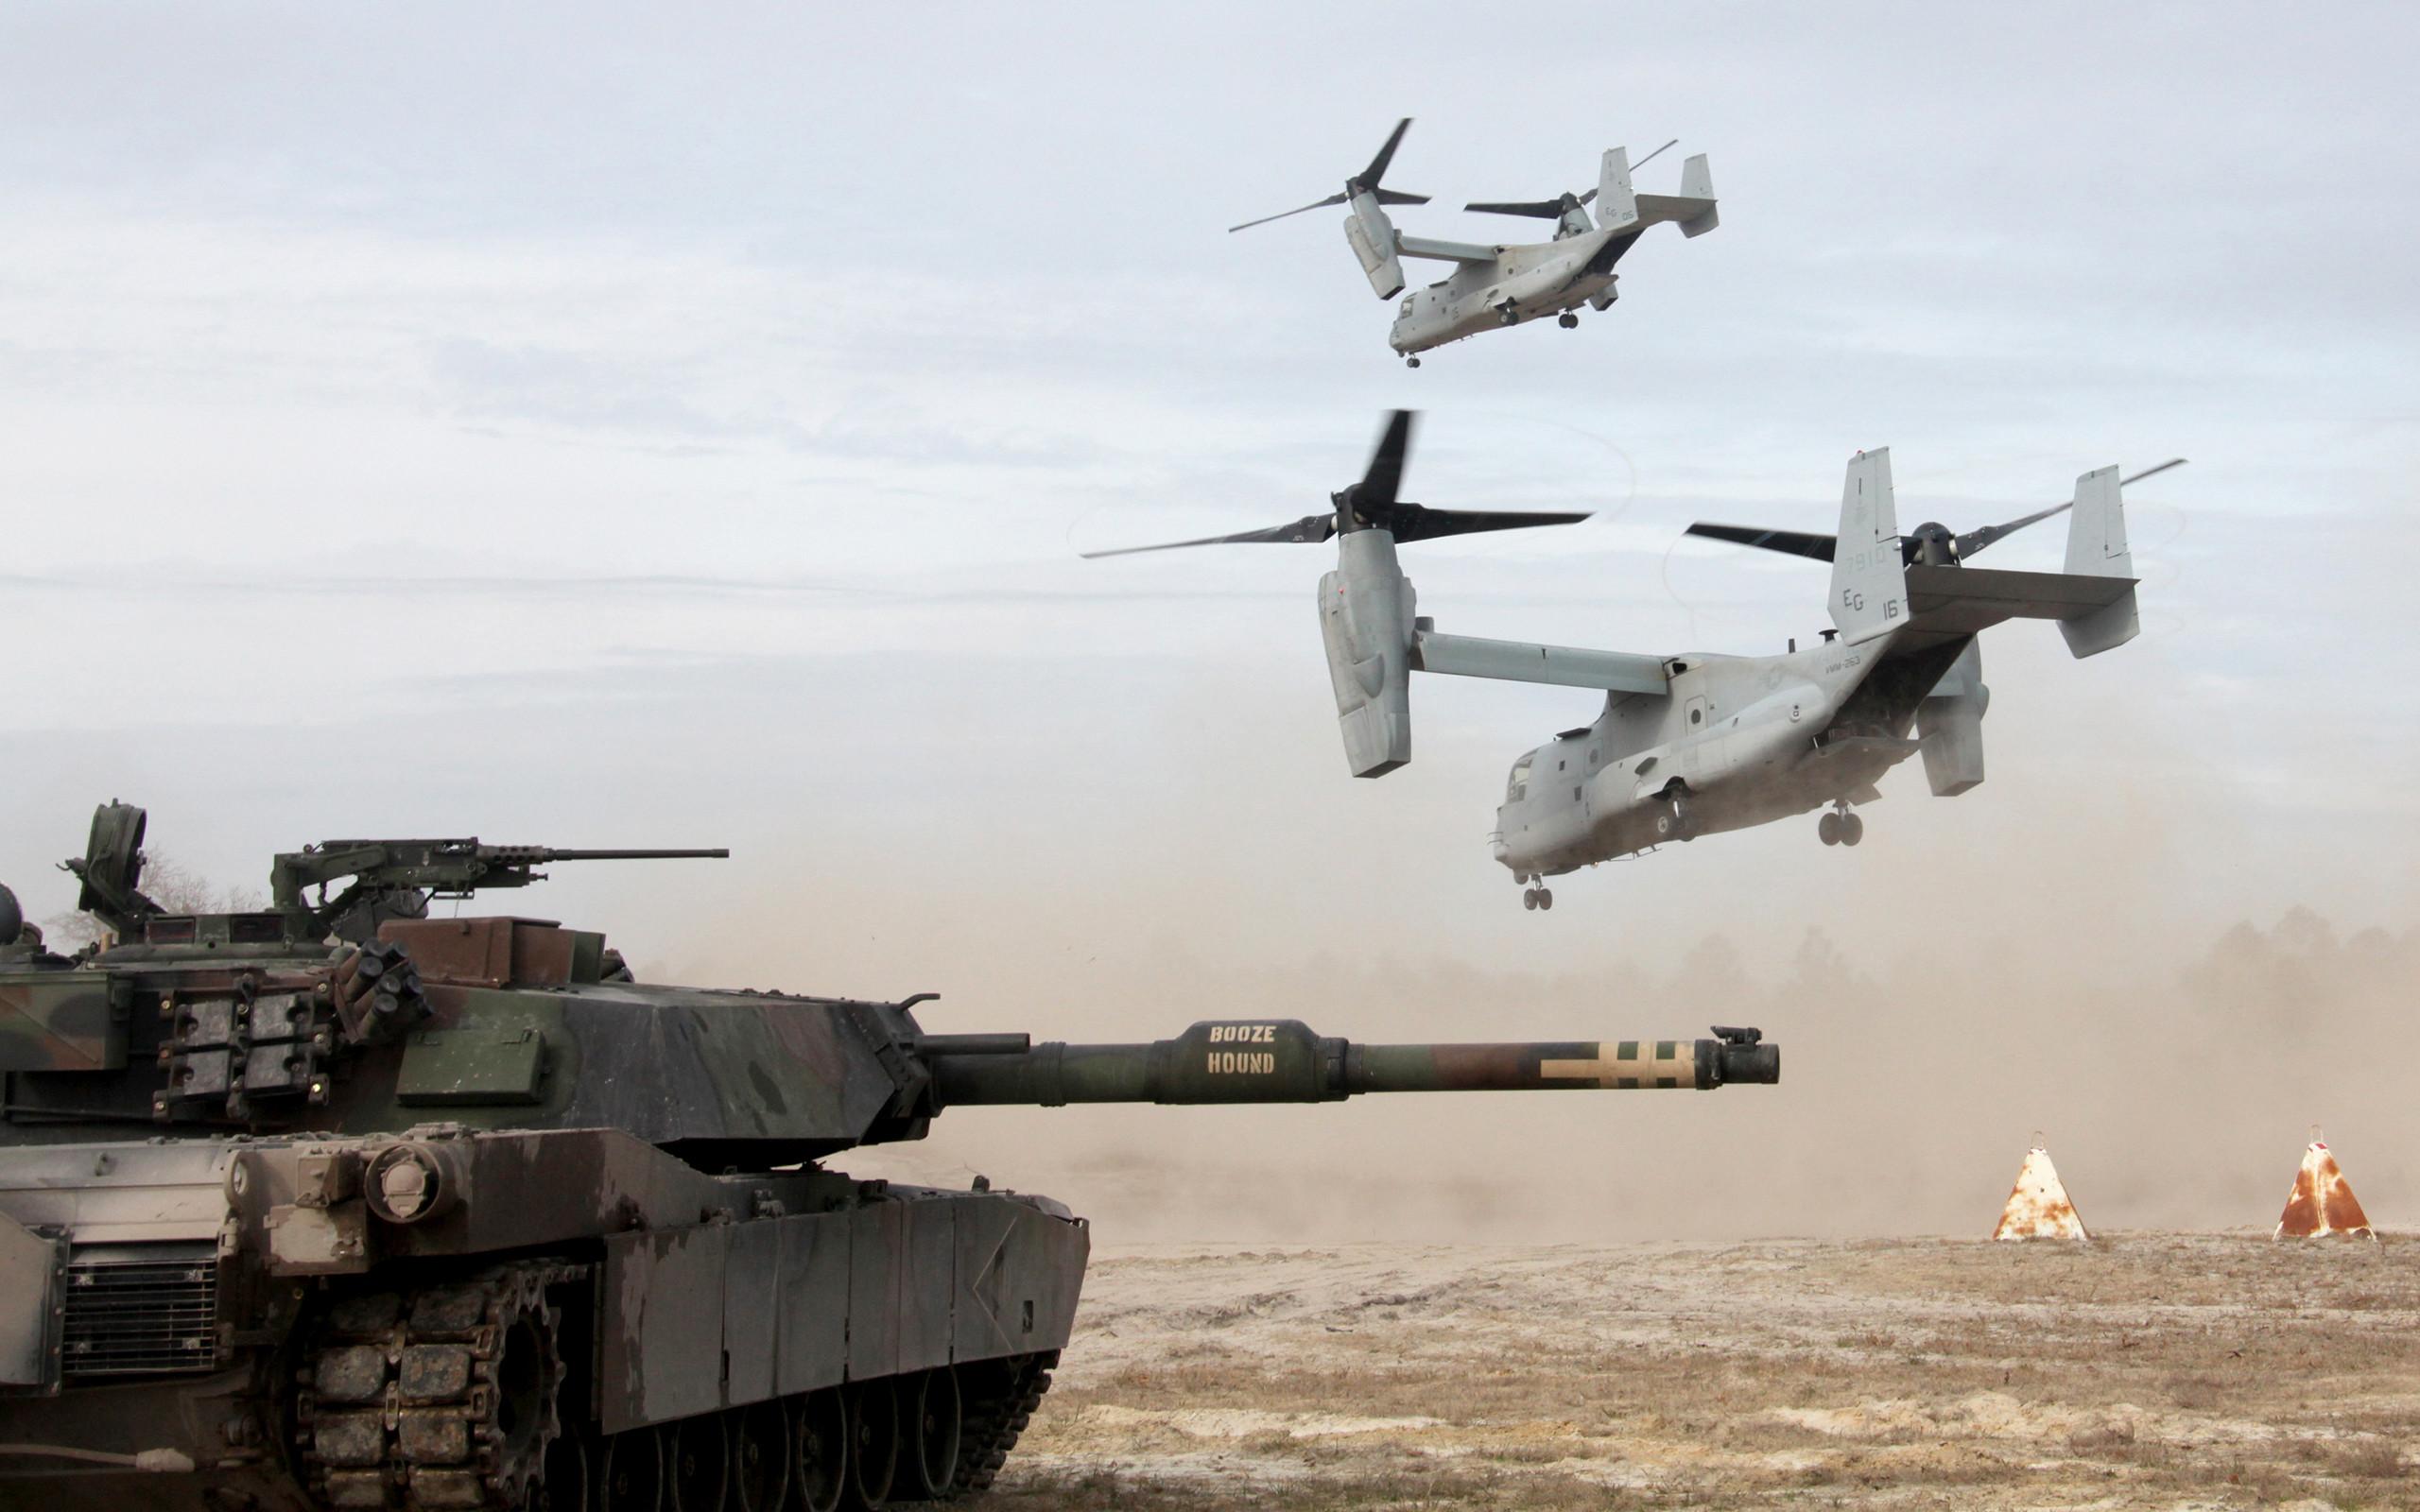 Aircraft M1A1 Abrams Tank Military Tanks United States Marine Corps V-22  Osprey …